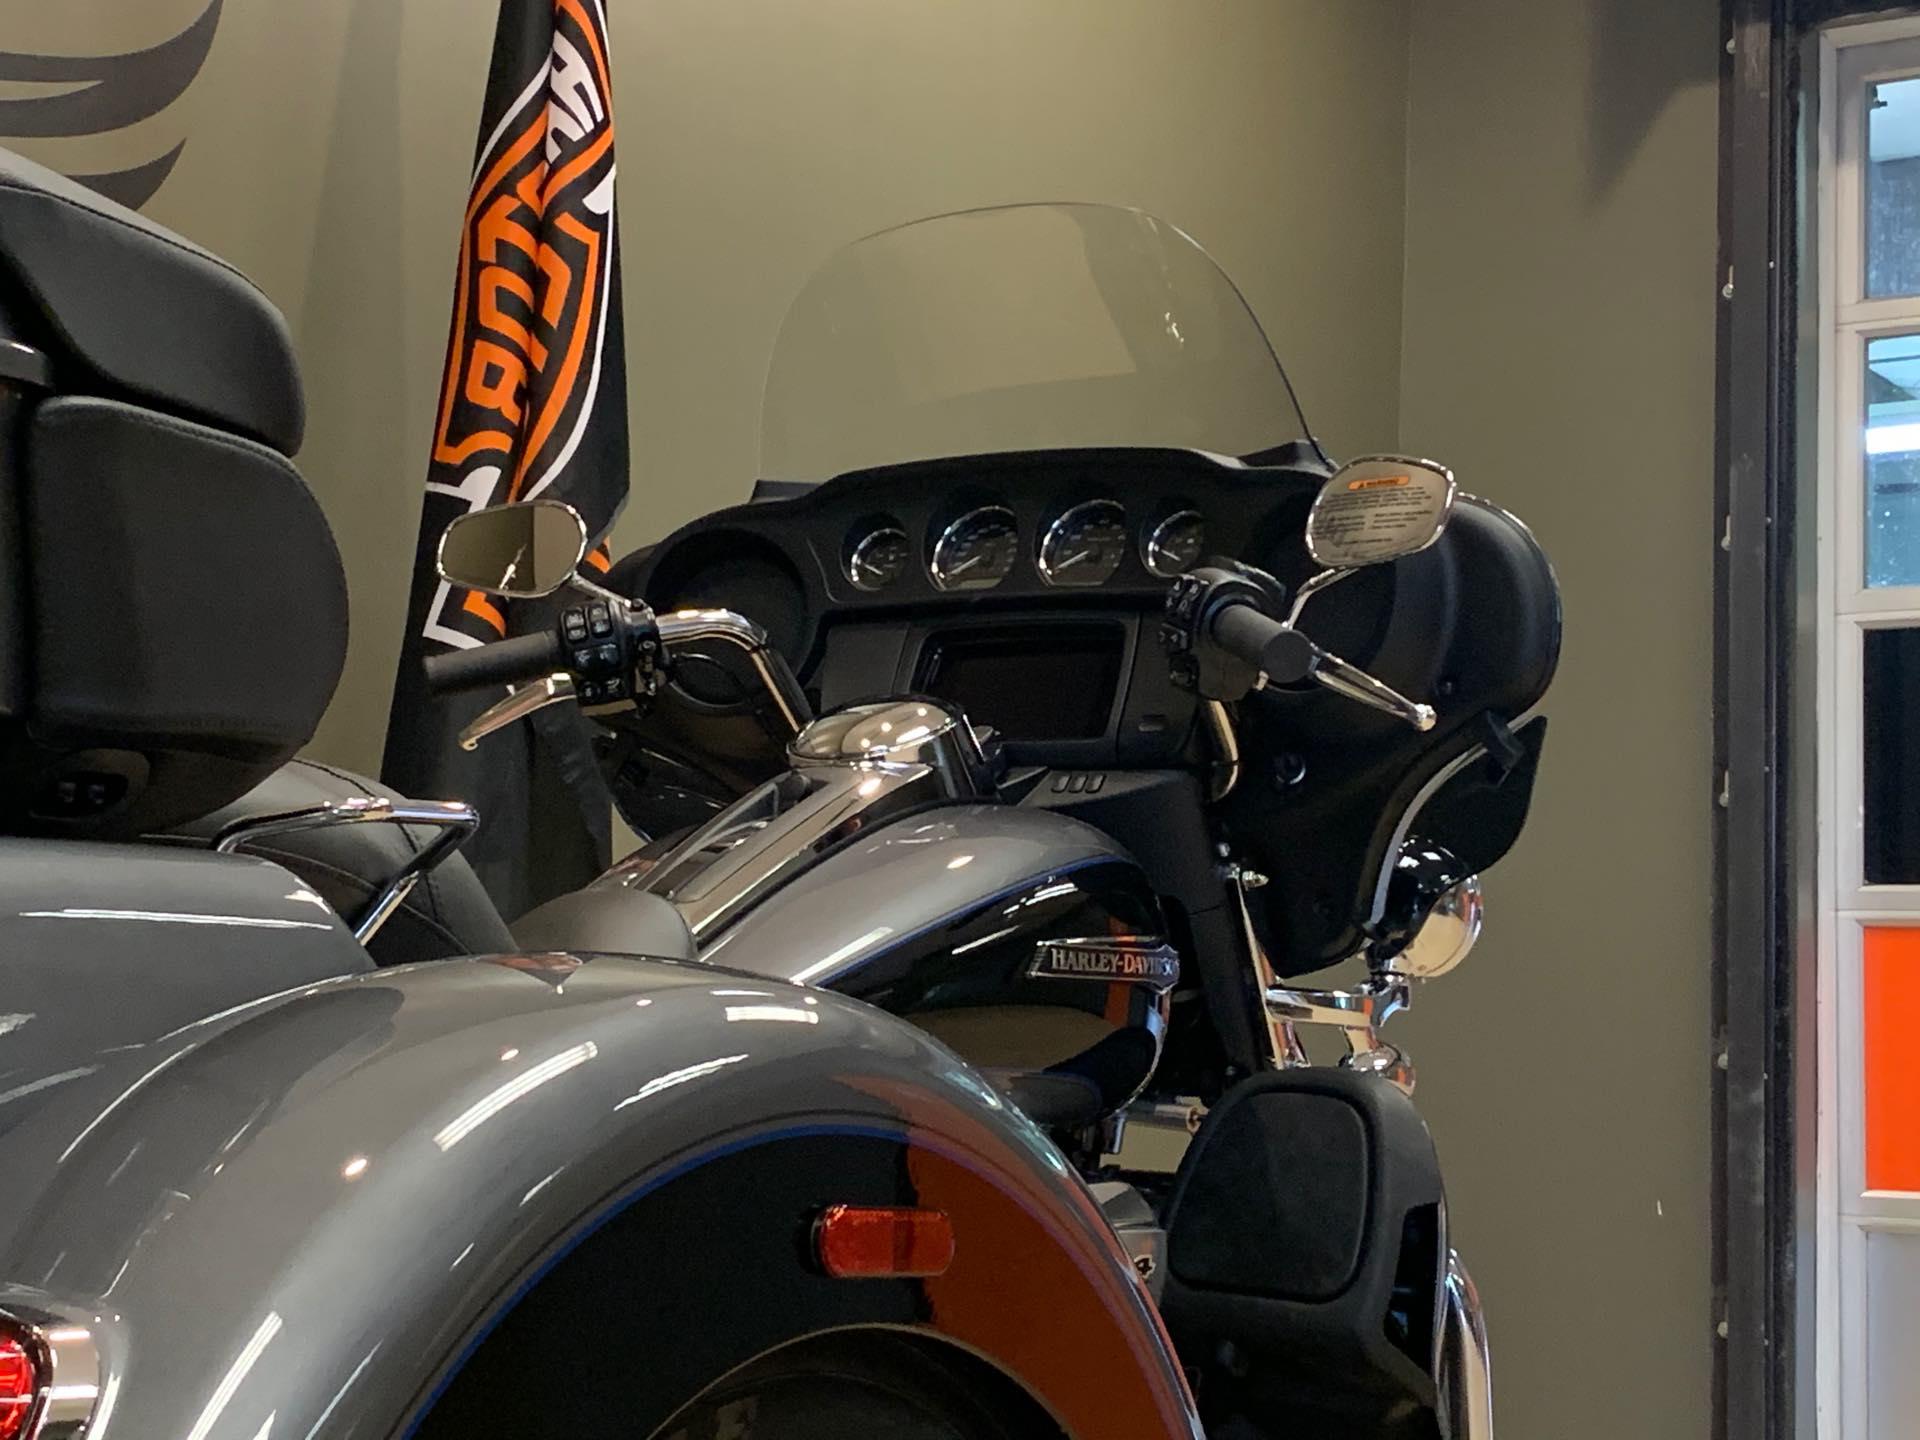 2021 Harley-Davidson Trike Tri Glide Ultra at Loess Hills Harley-Davidson